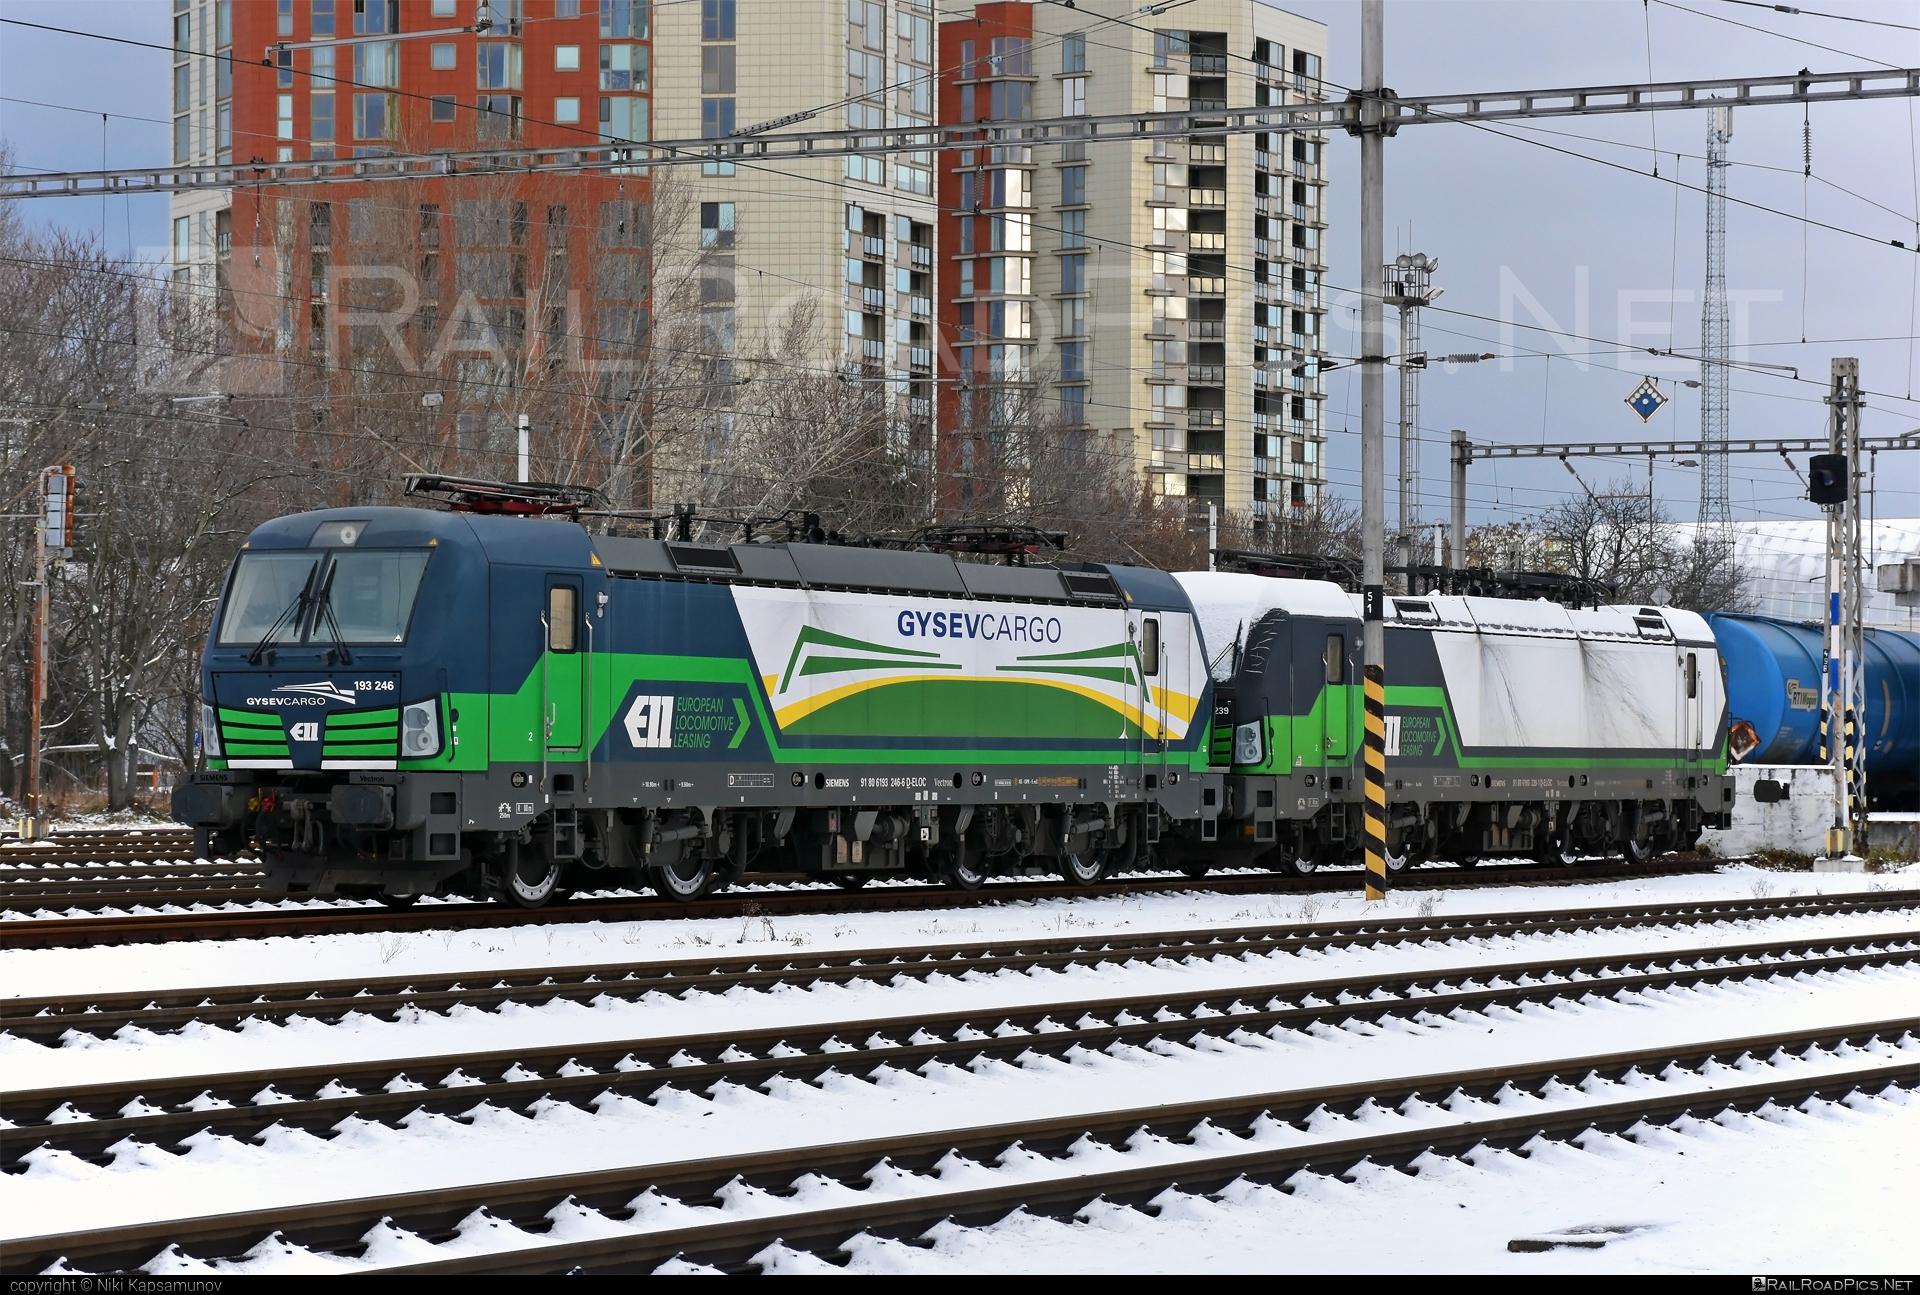 Siemens Vectron AC - 193 246-6 operated by GYSEV Cargo Zrt #ell #ellgermany #eloc #europeanlocomotiveleasing #gysev #gysevcargo #siemens #siemensvectron #siemensvectronac #vectron #vectronac